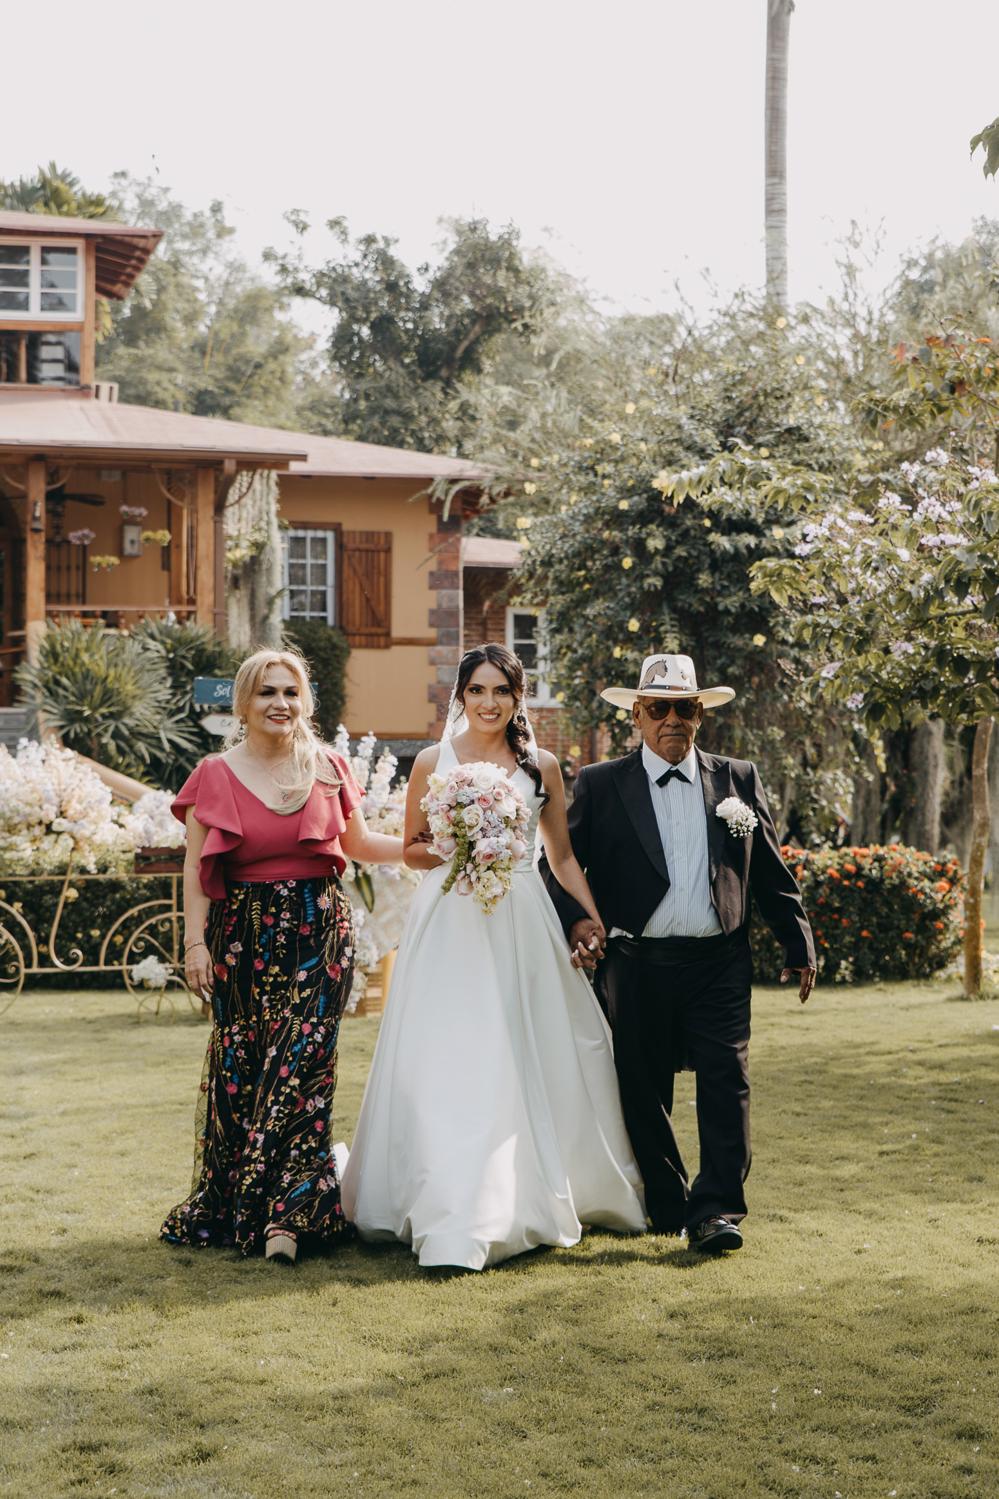 Michelle-Agurto-Fotografia-Bodas-Ecuador-Destination-Wedding-Photographer-Sol-Matthias-101.JPG